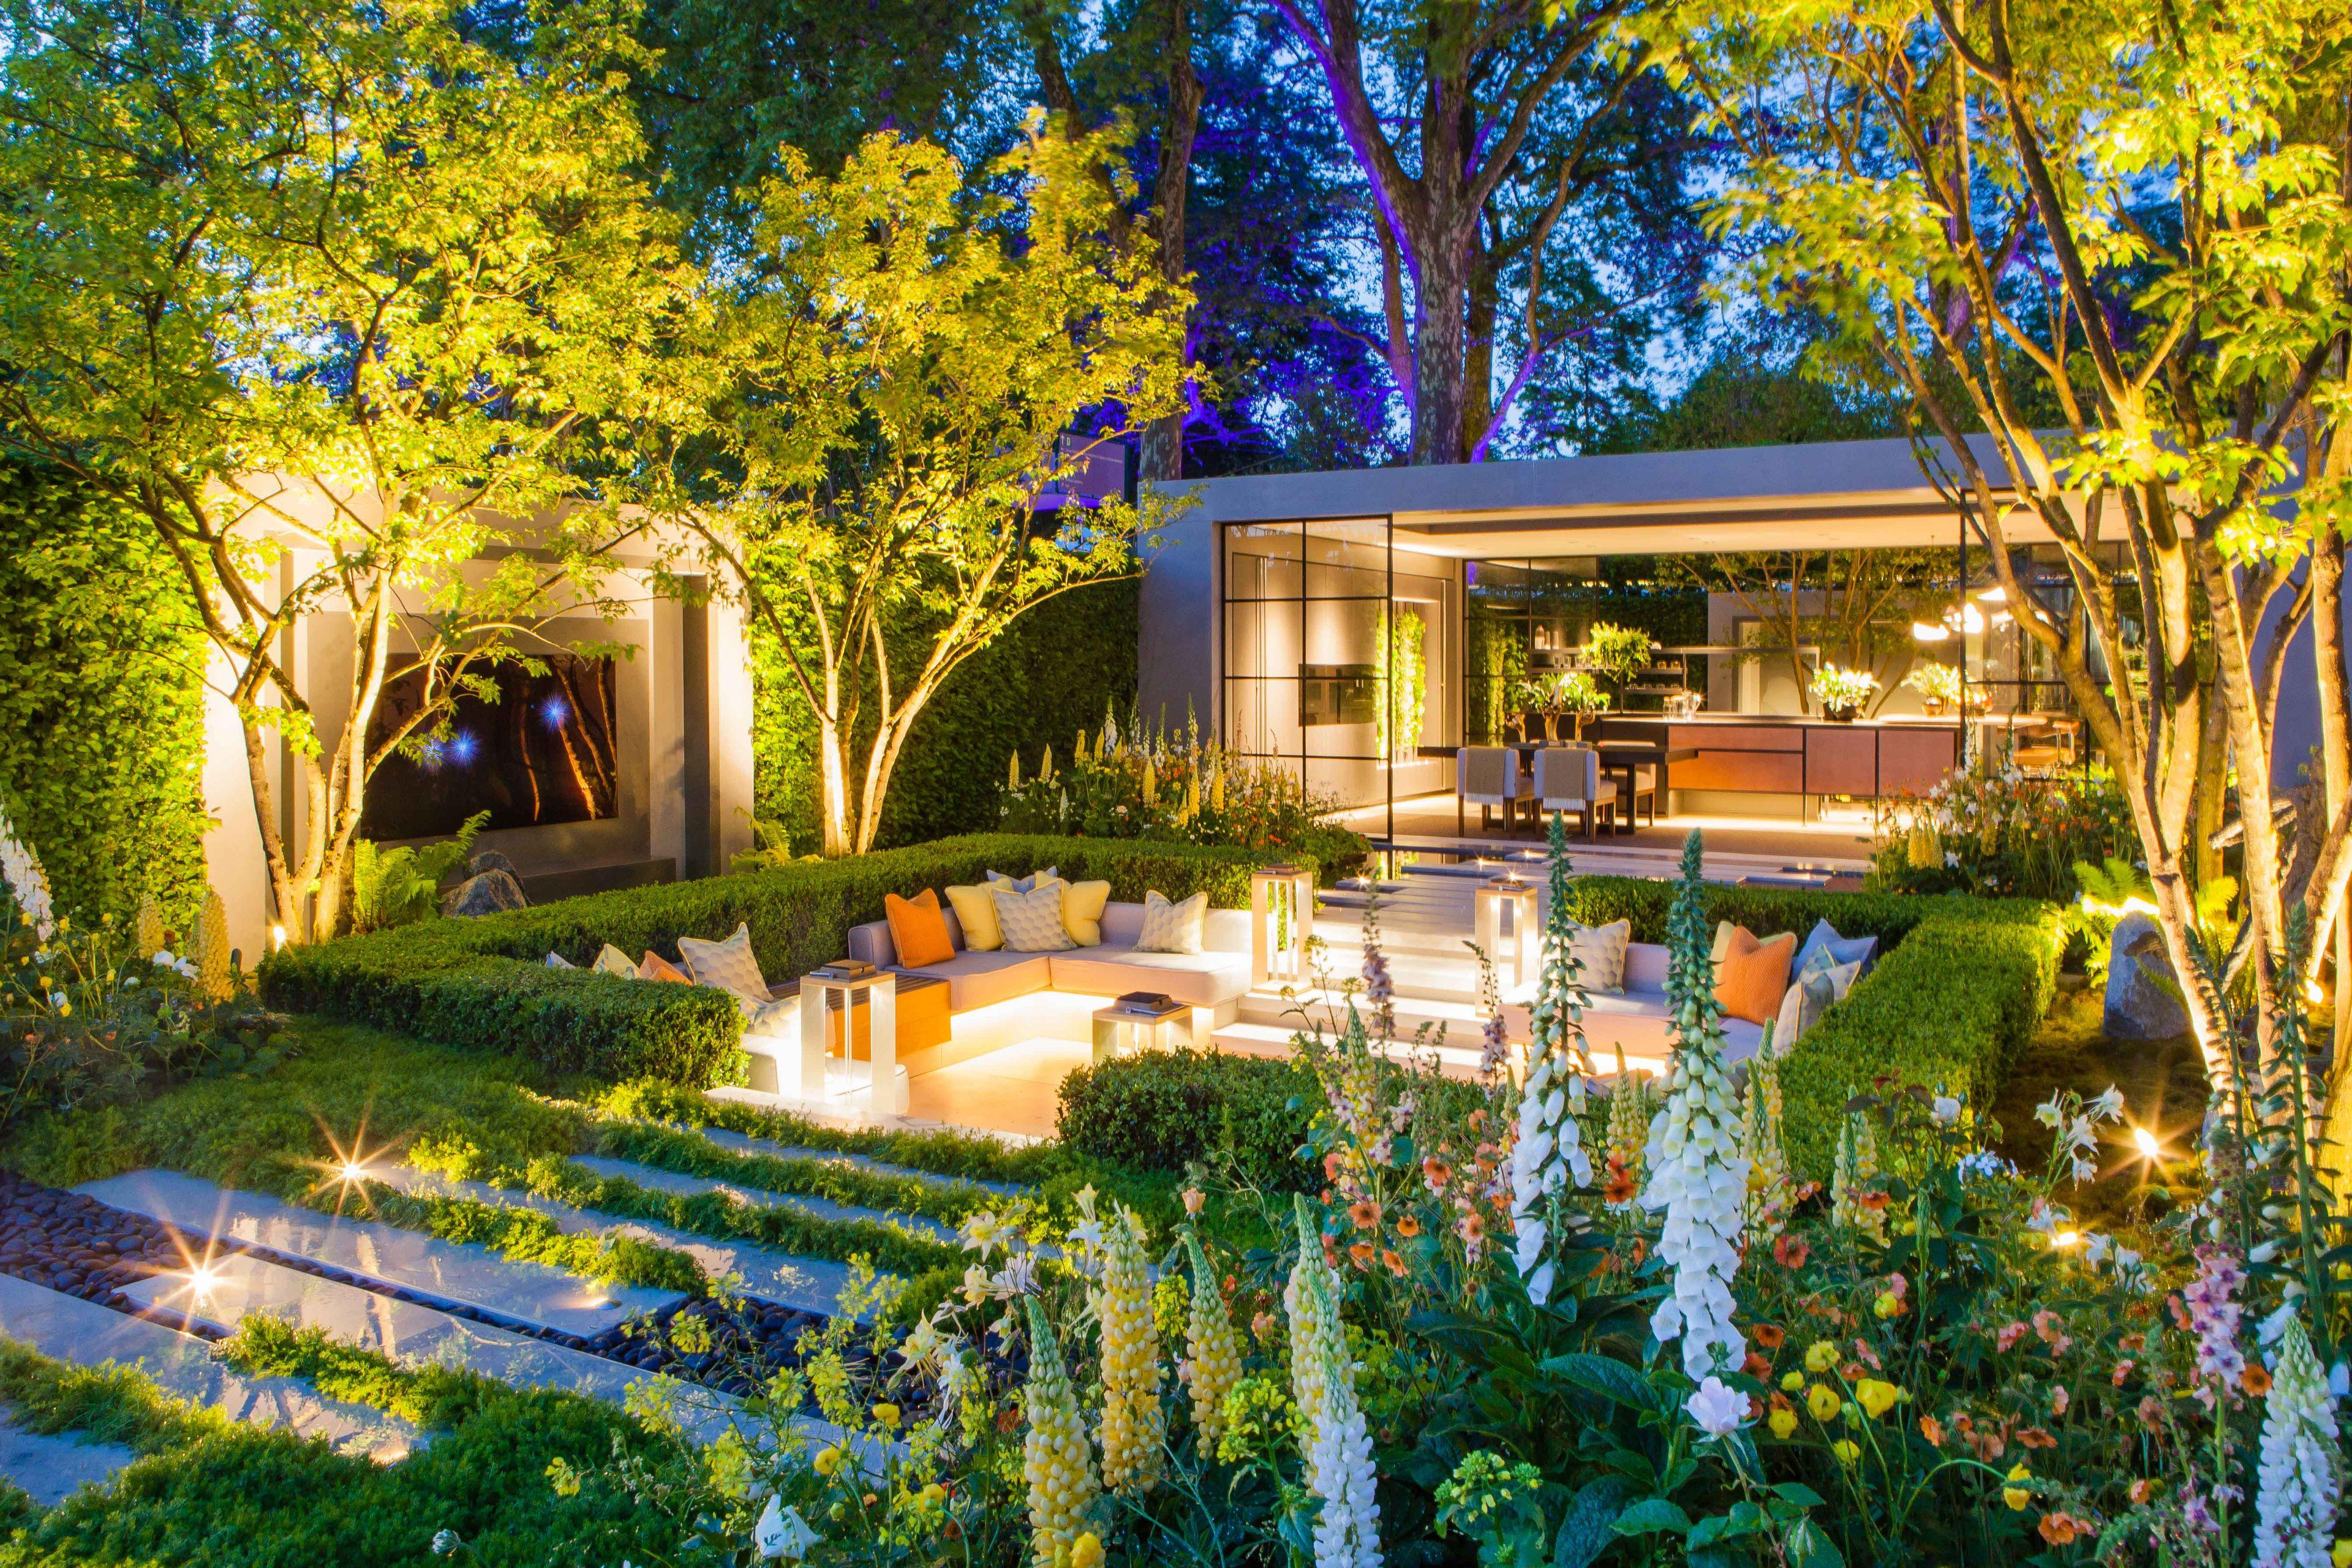 The garden at night (photo: LG)